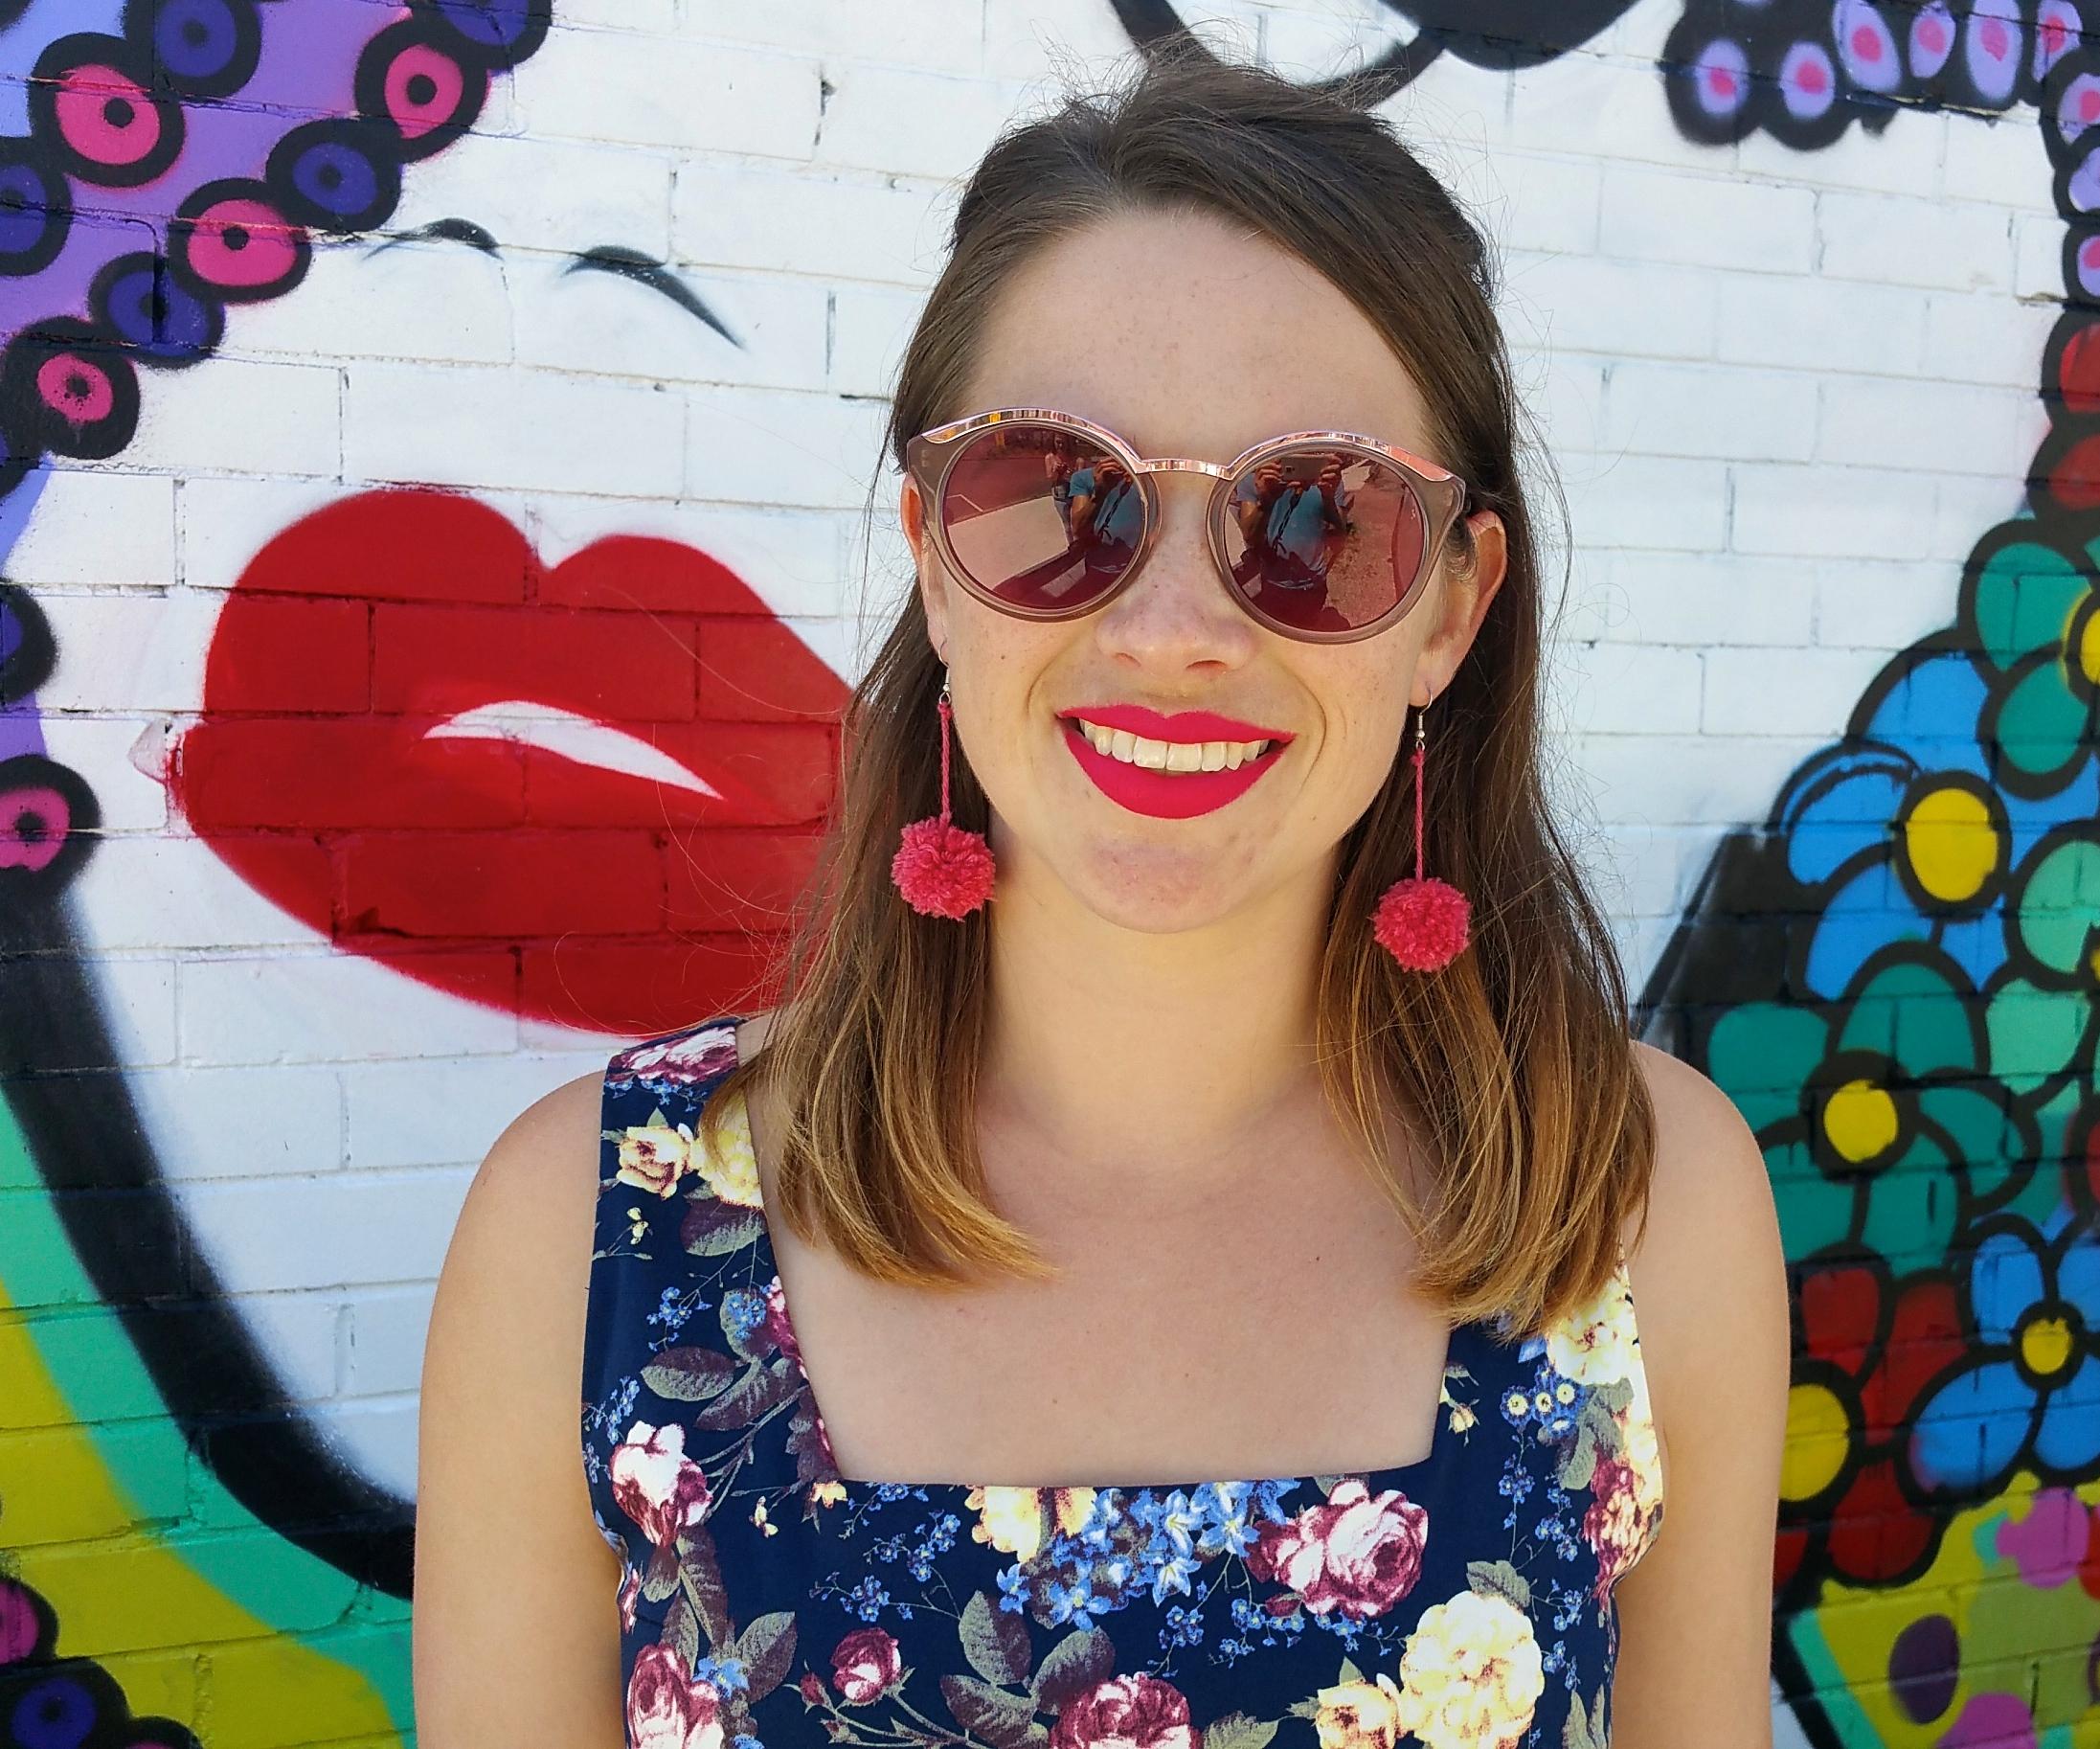 pom-pom-earrings-floral-dress-pink-refelctive-sunglasses